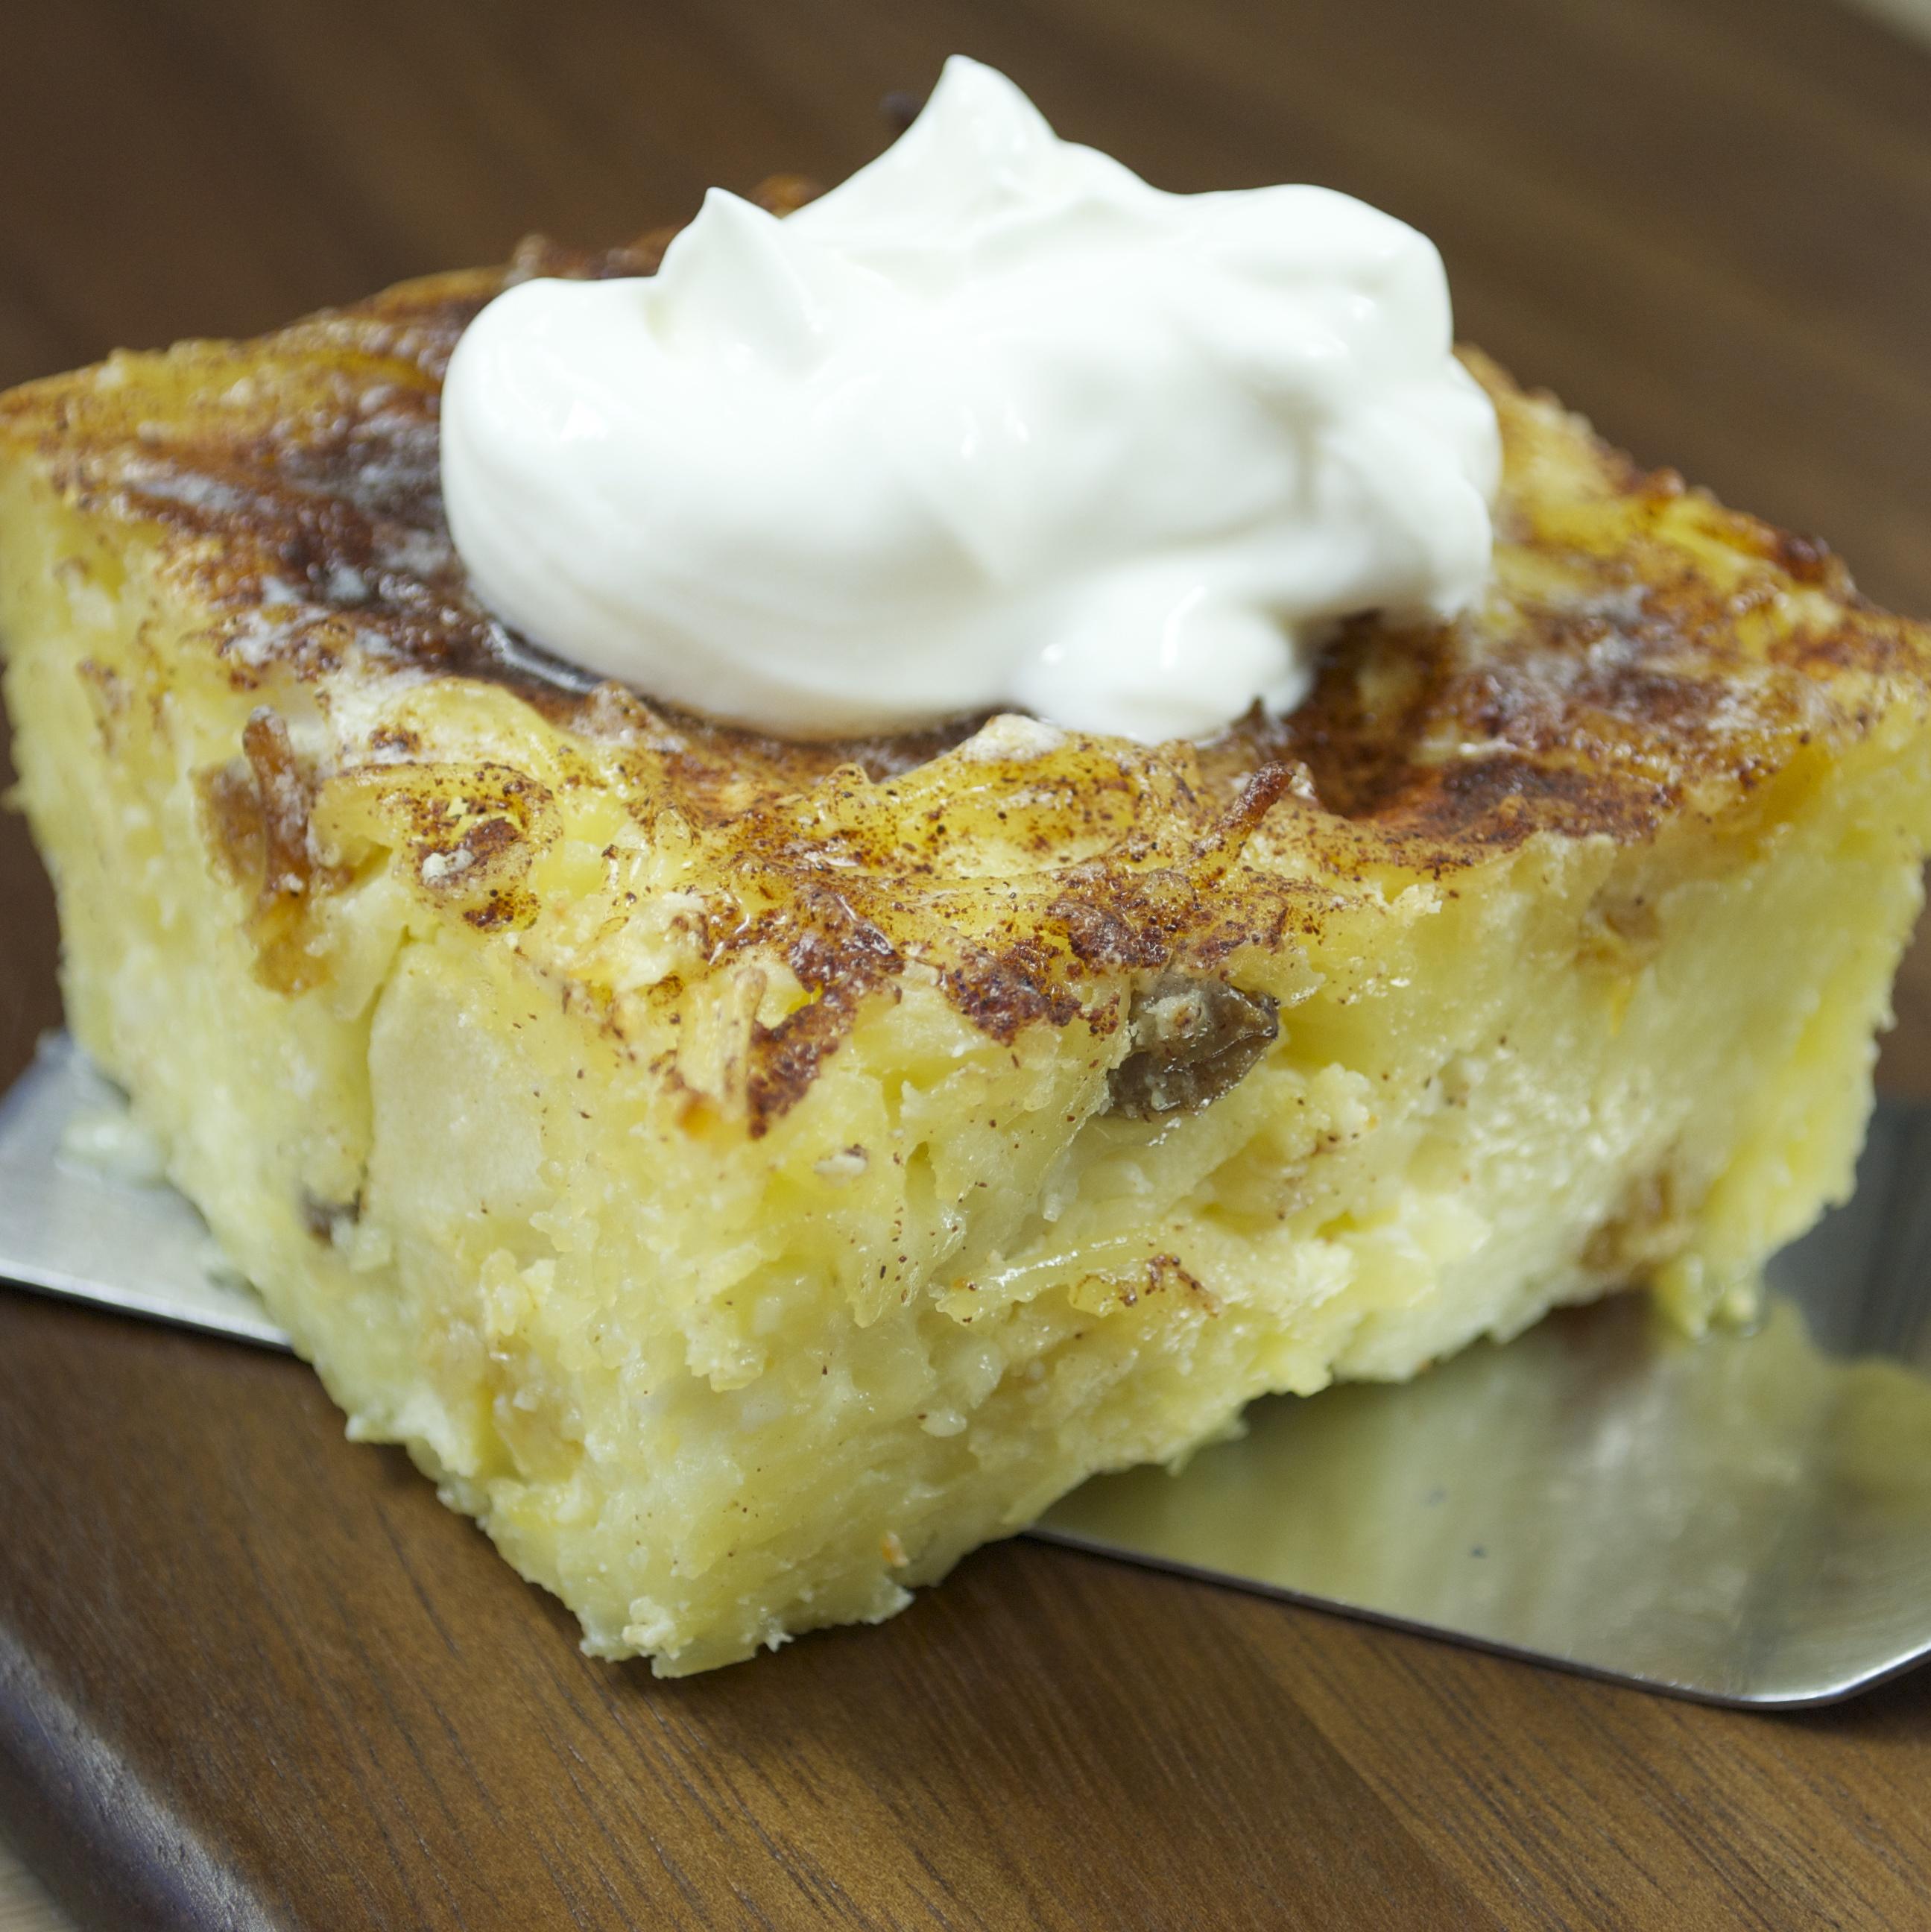 Kugel Noodle Pudding - Mama's Gotta Bake